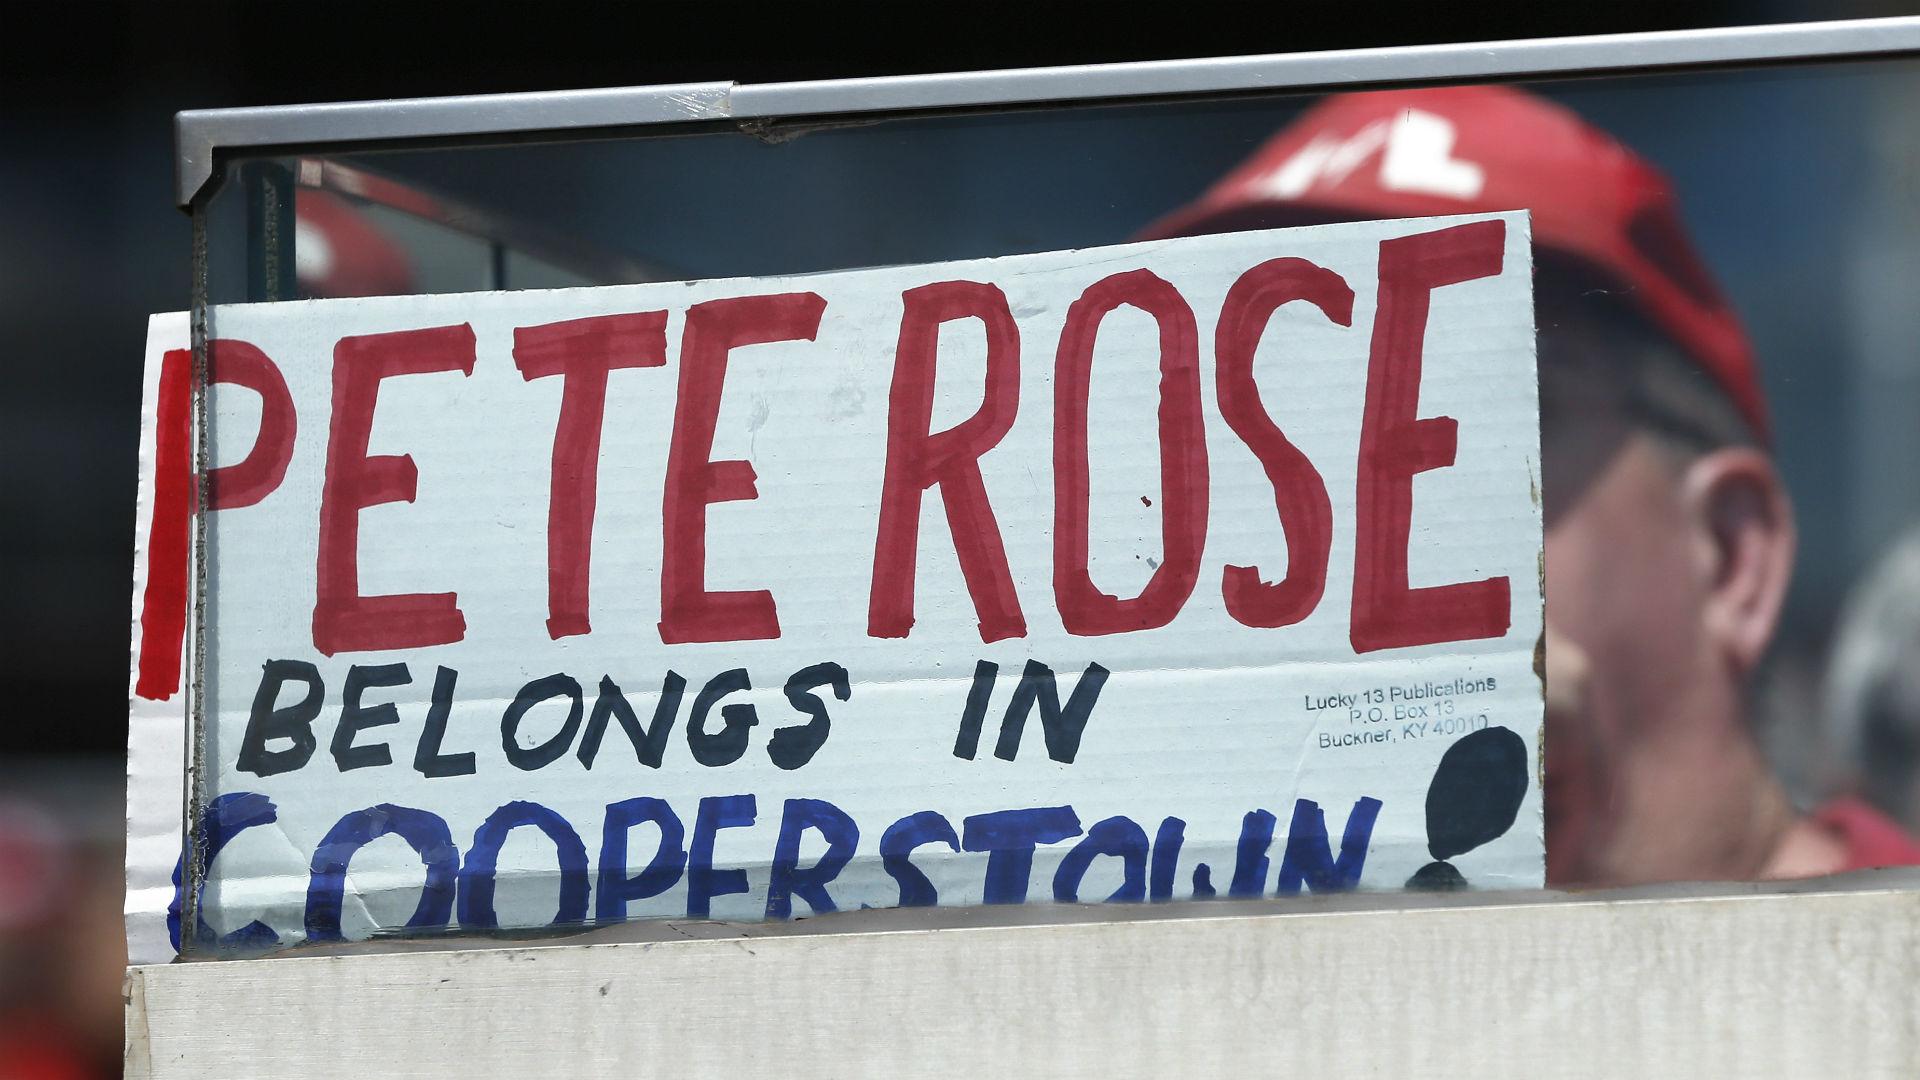 RosePete42GettyUs